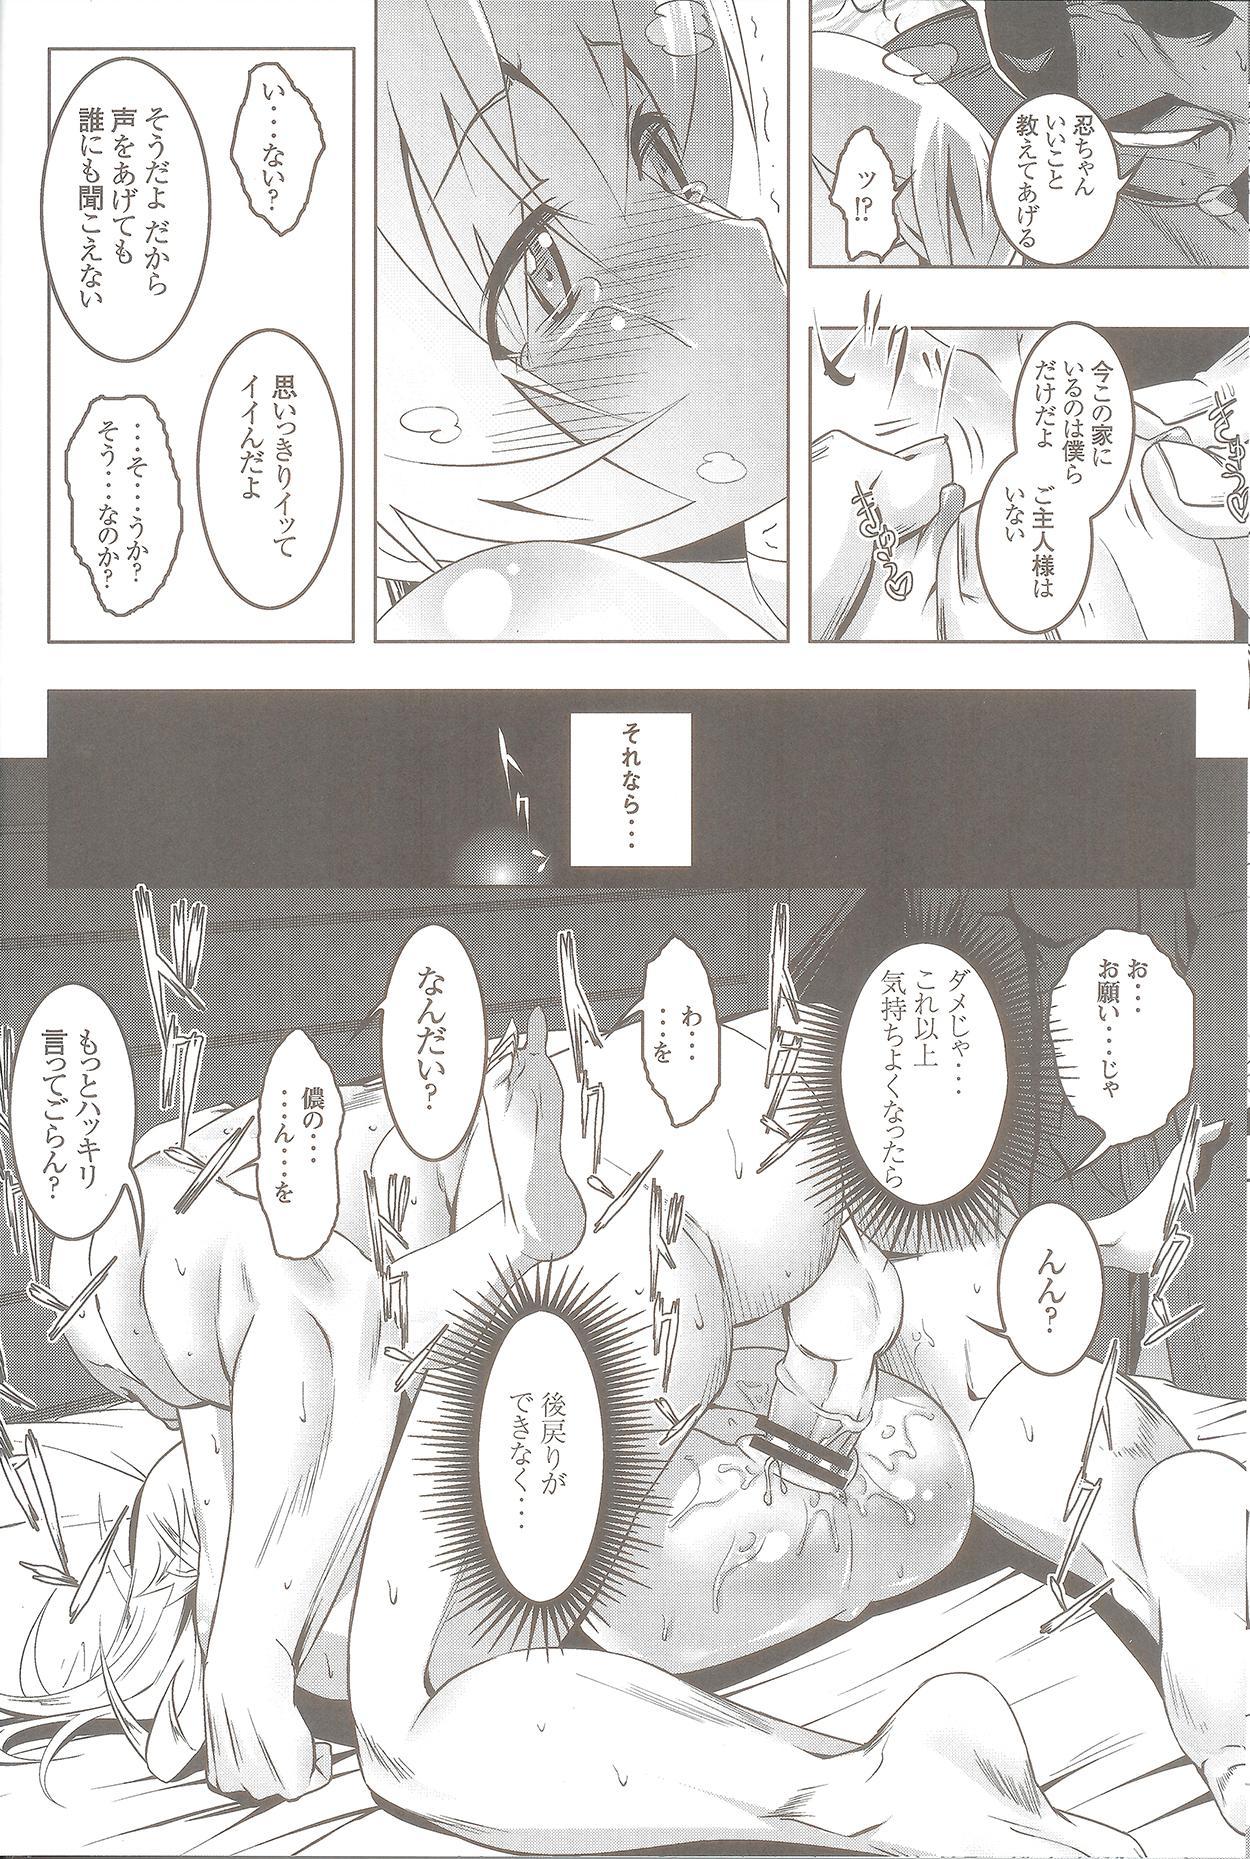 Netoraregatari San 21